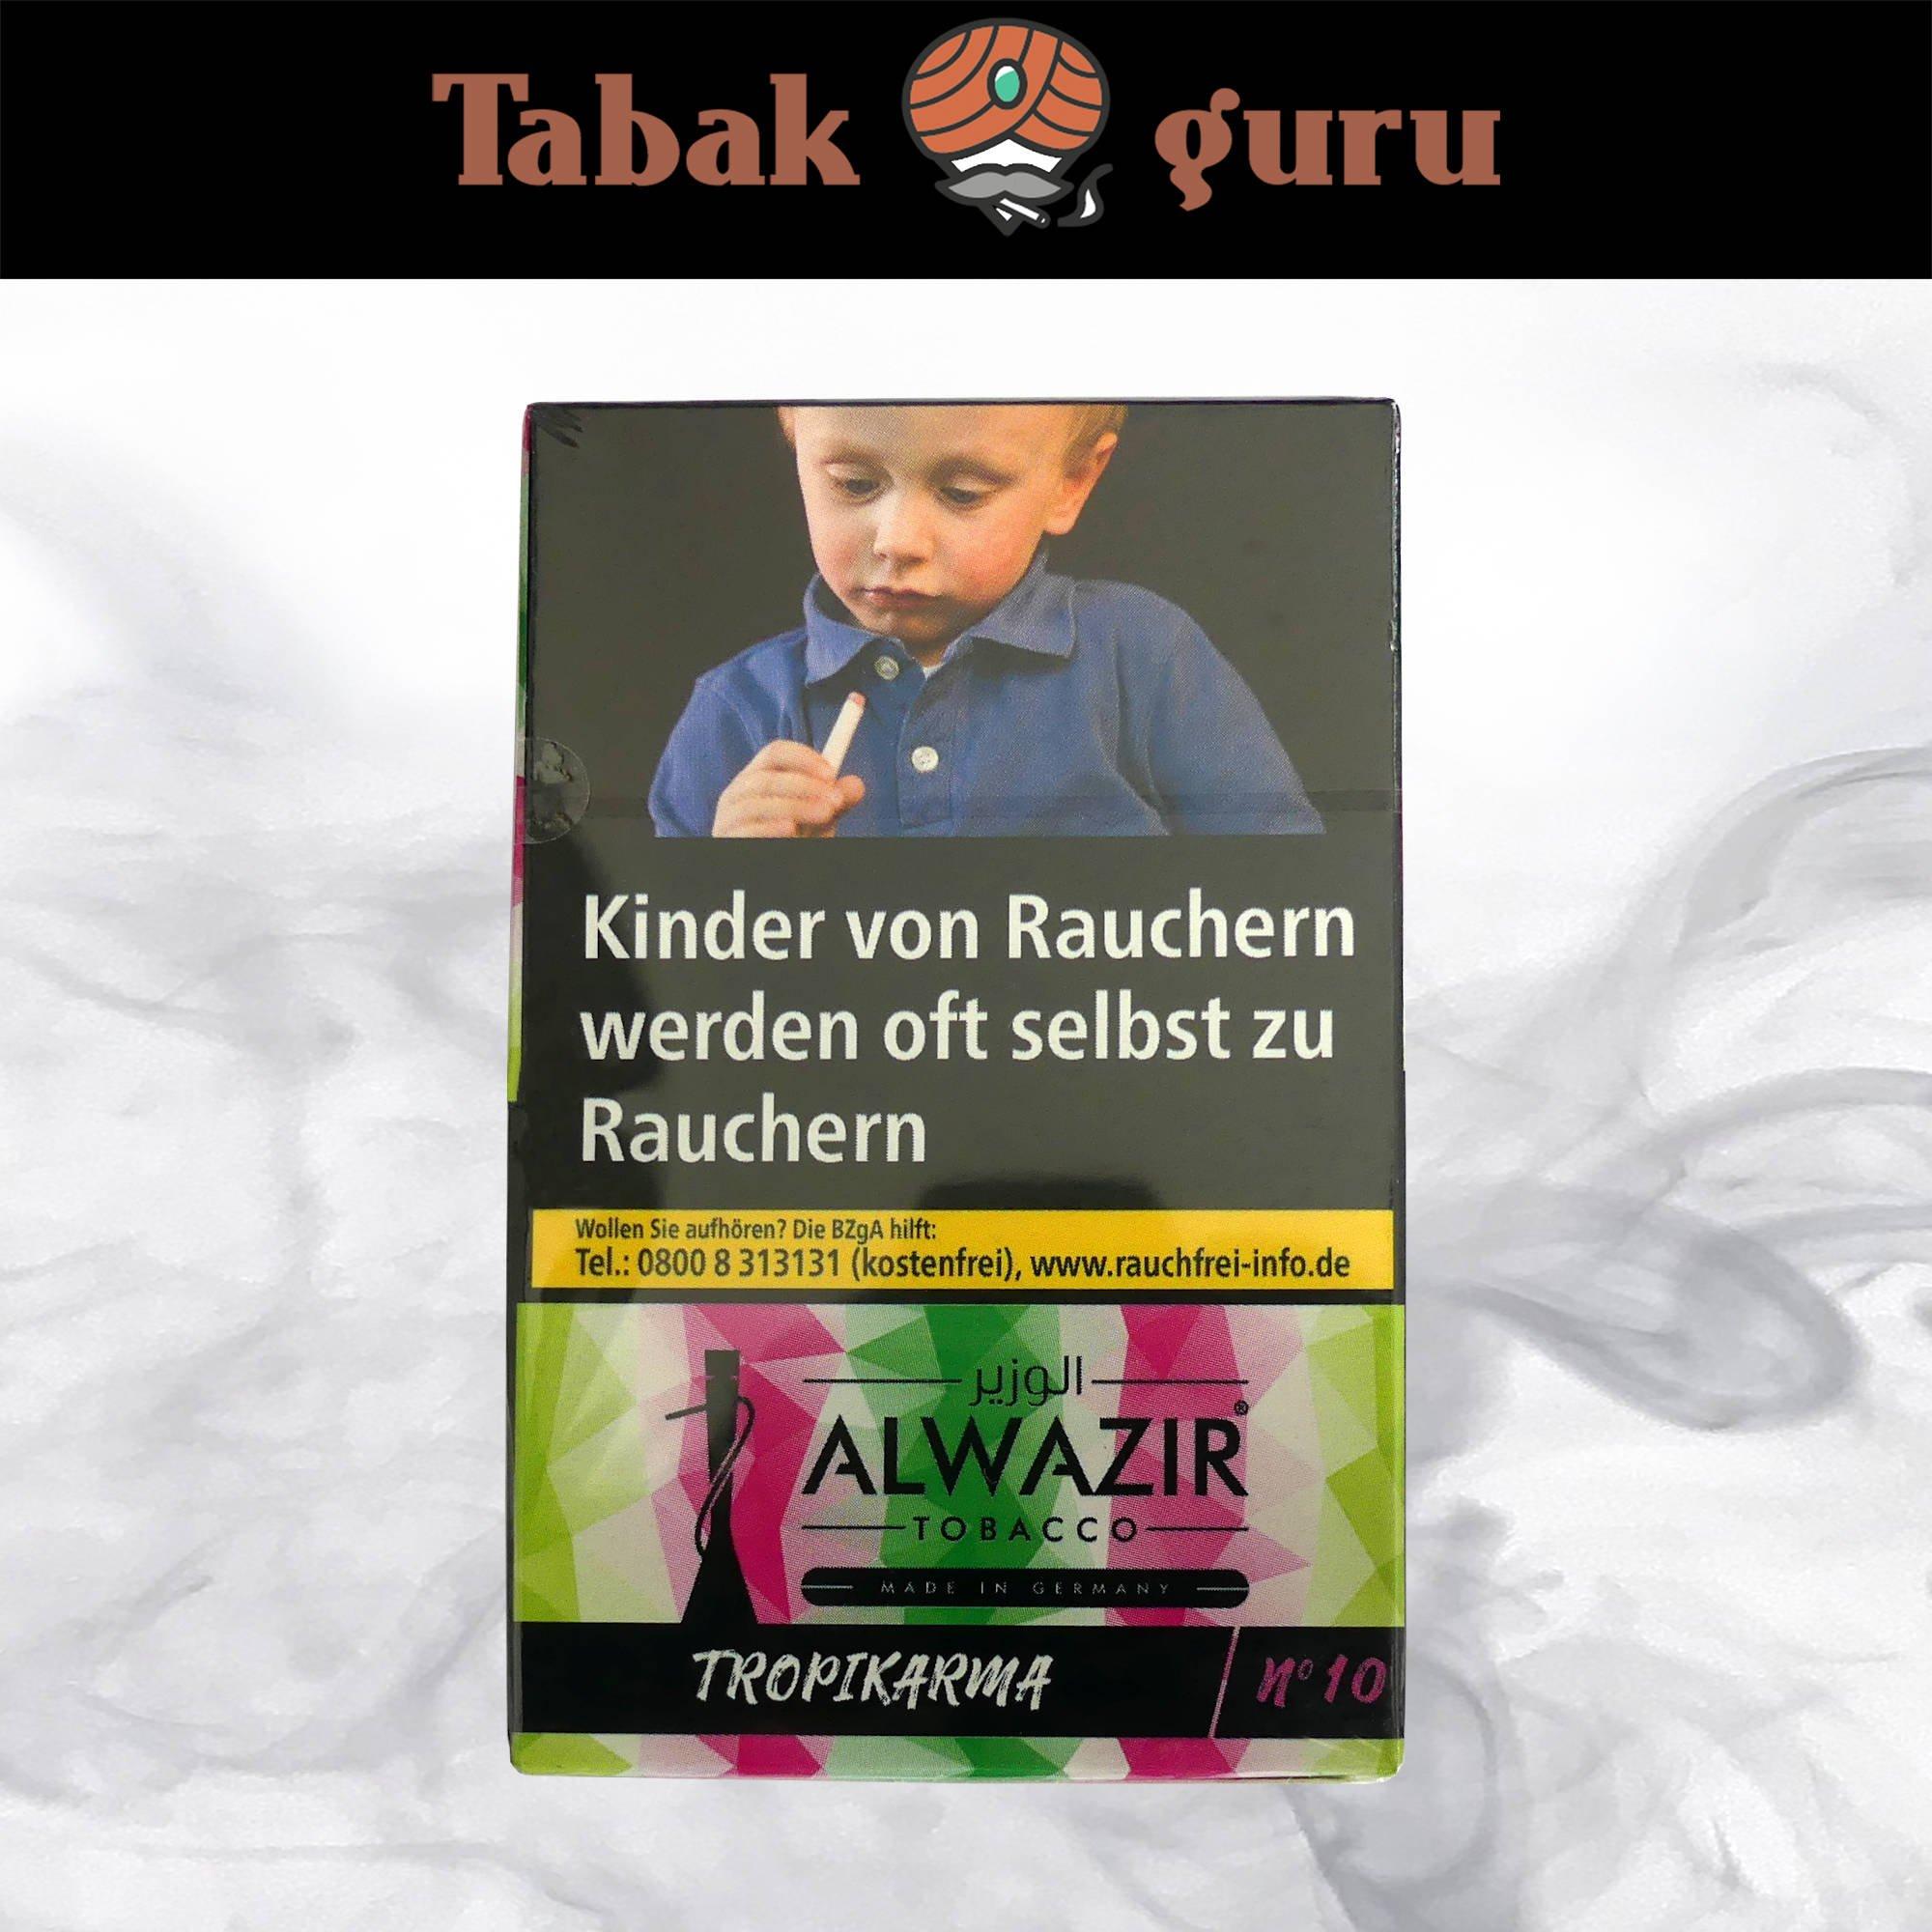 Alwazir Shisha Tabak - No. 10 - TROPIKARMA 50g